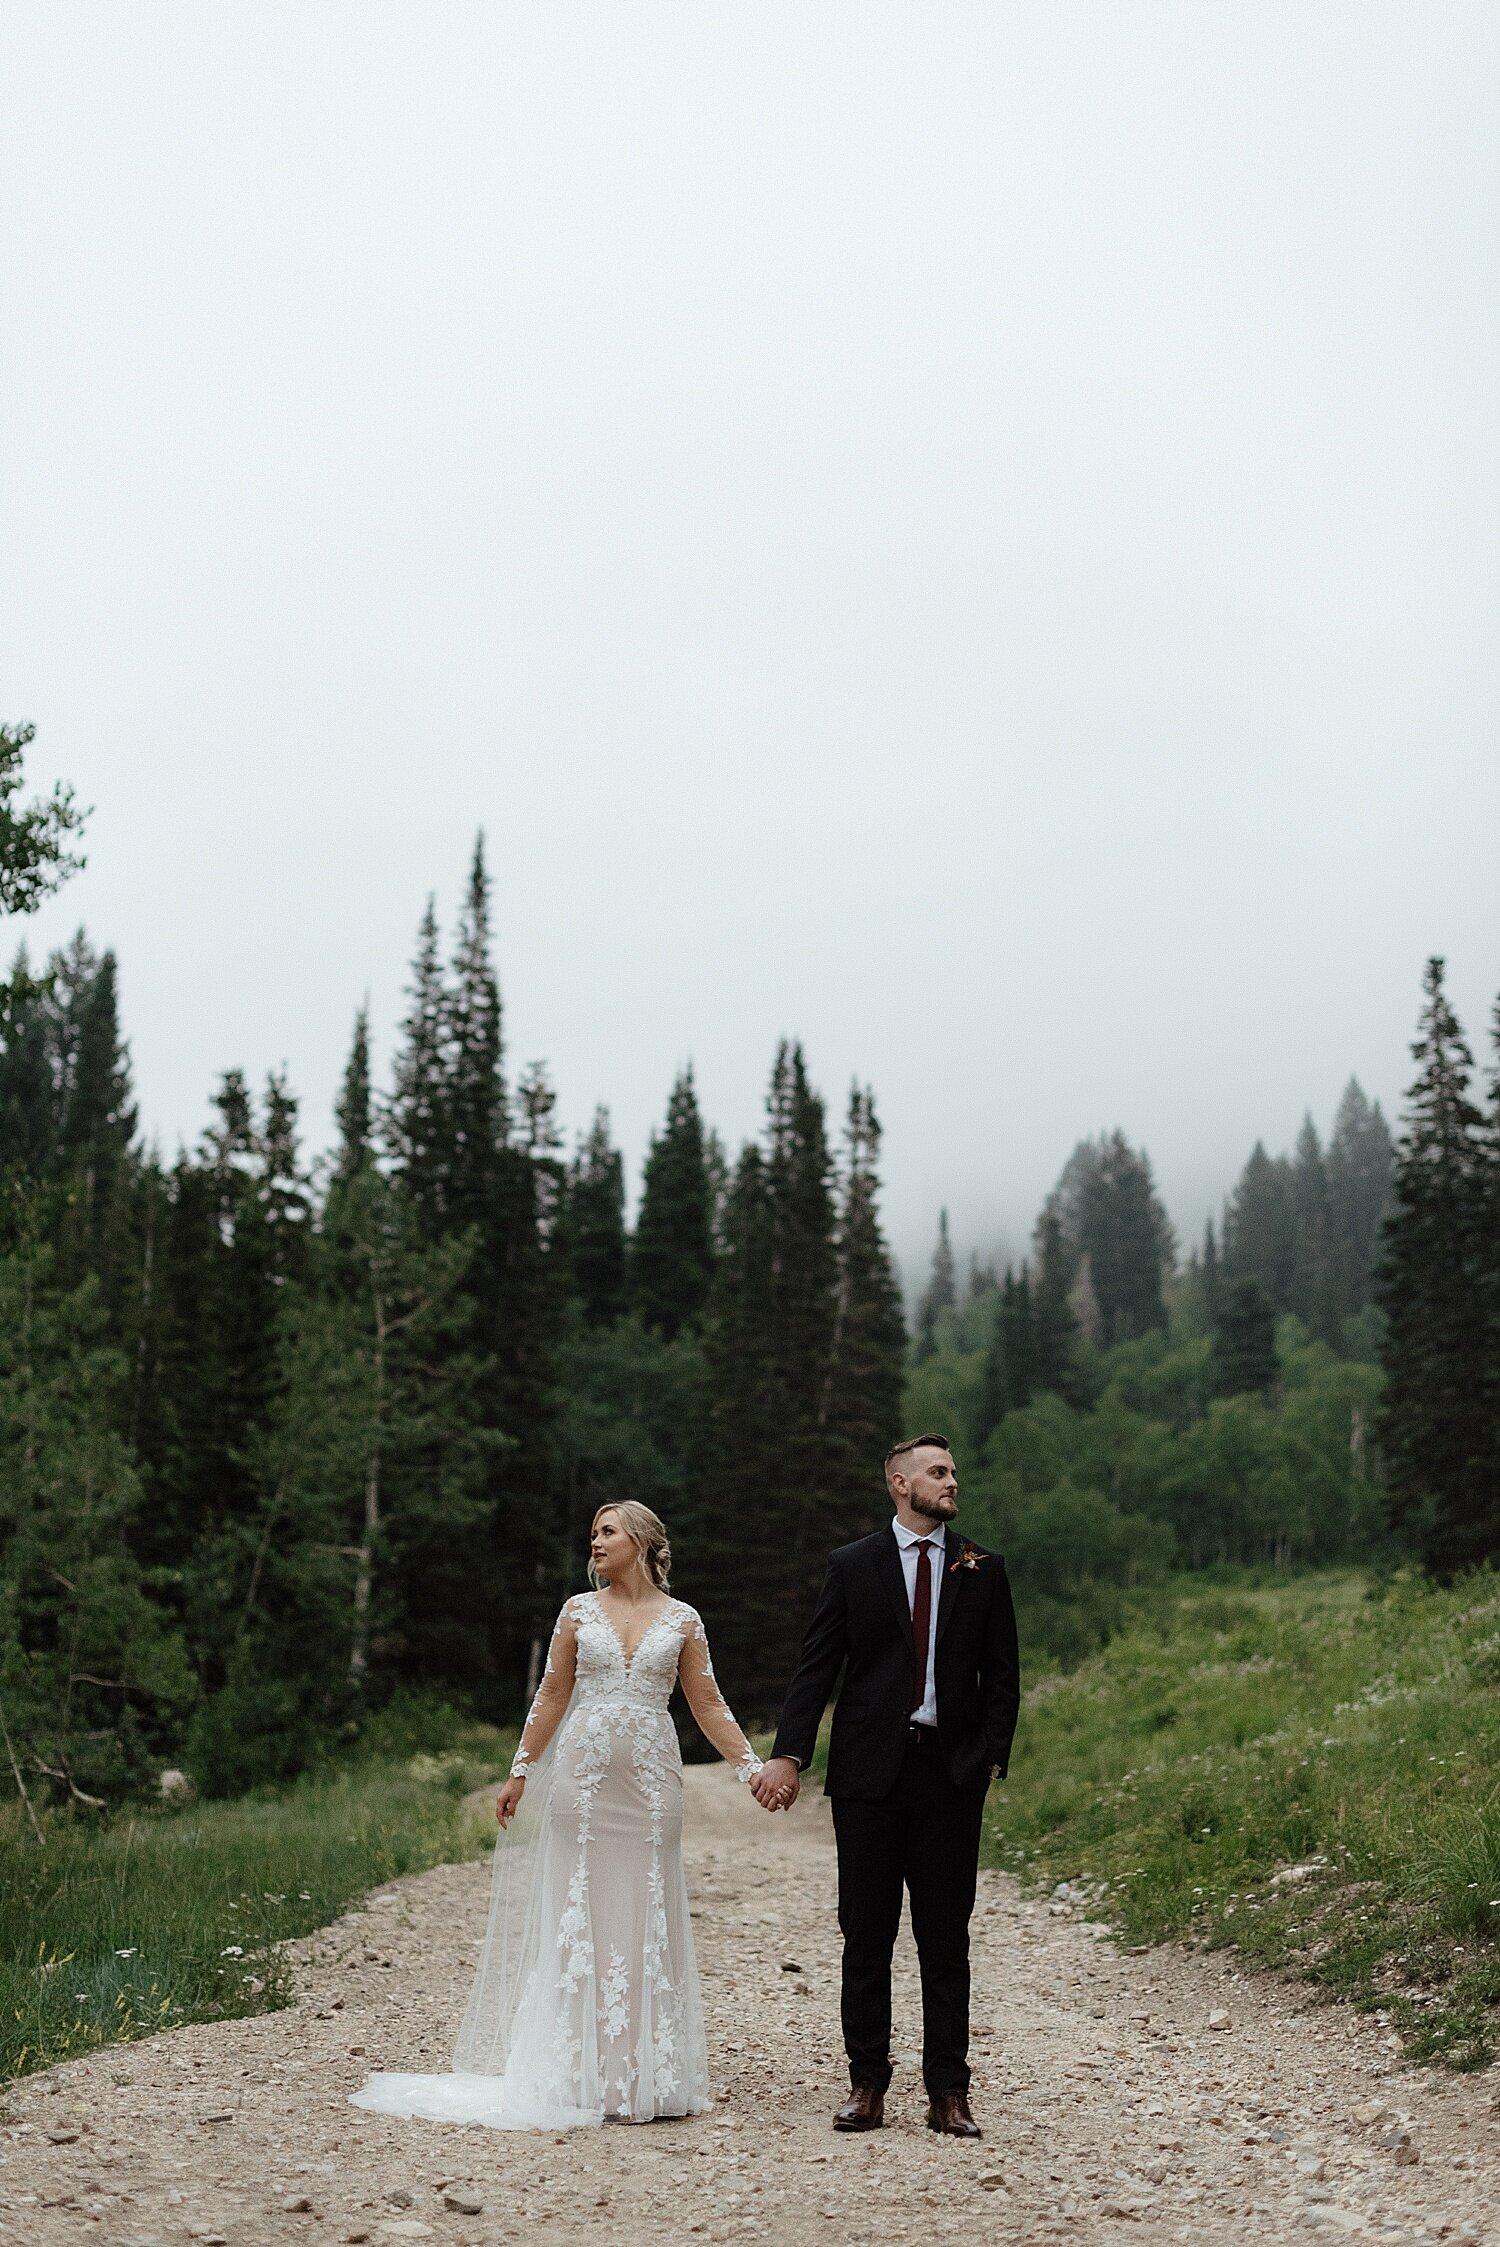 Zandra Barriga Photo - Hunter and Brighton Mountain Bridals_0017.jpg